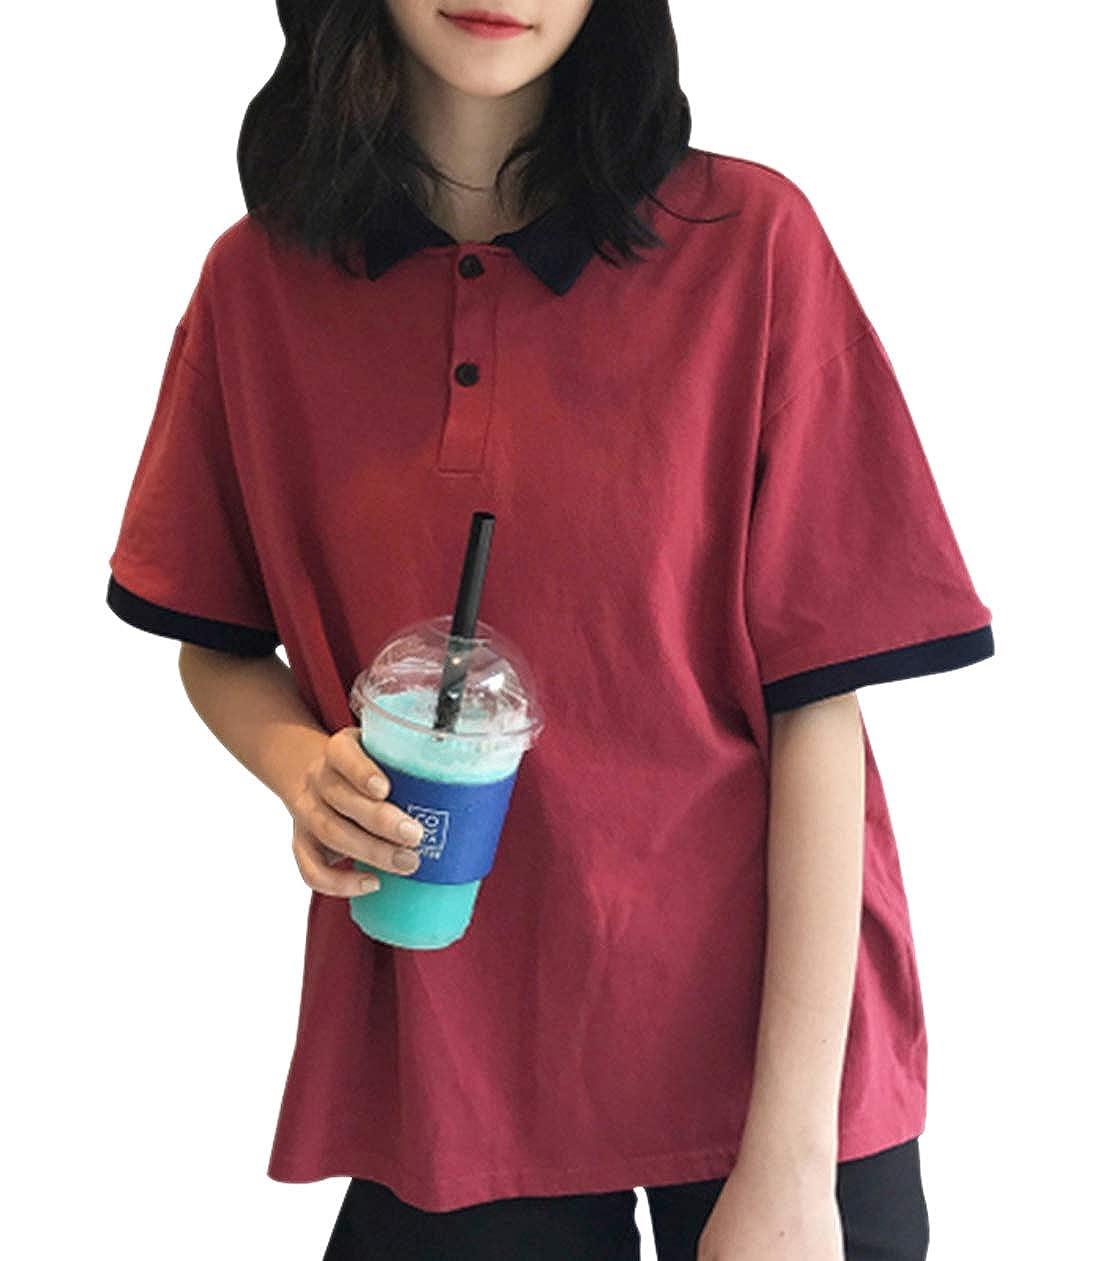 Chartou Womens Casual 2-Button Short Sleeve Contrast Color Junior Cute Polo Shirts